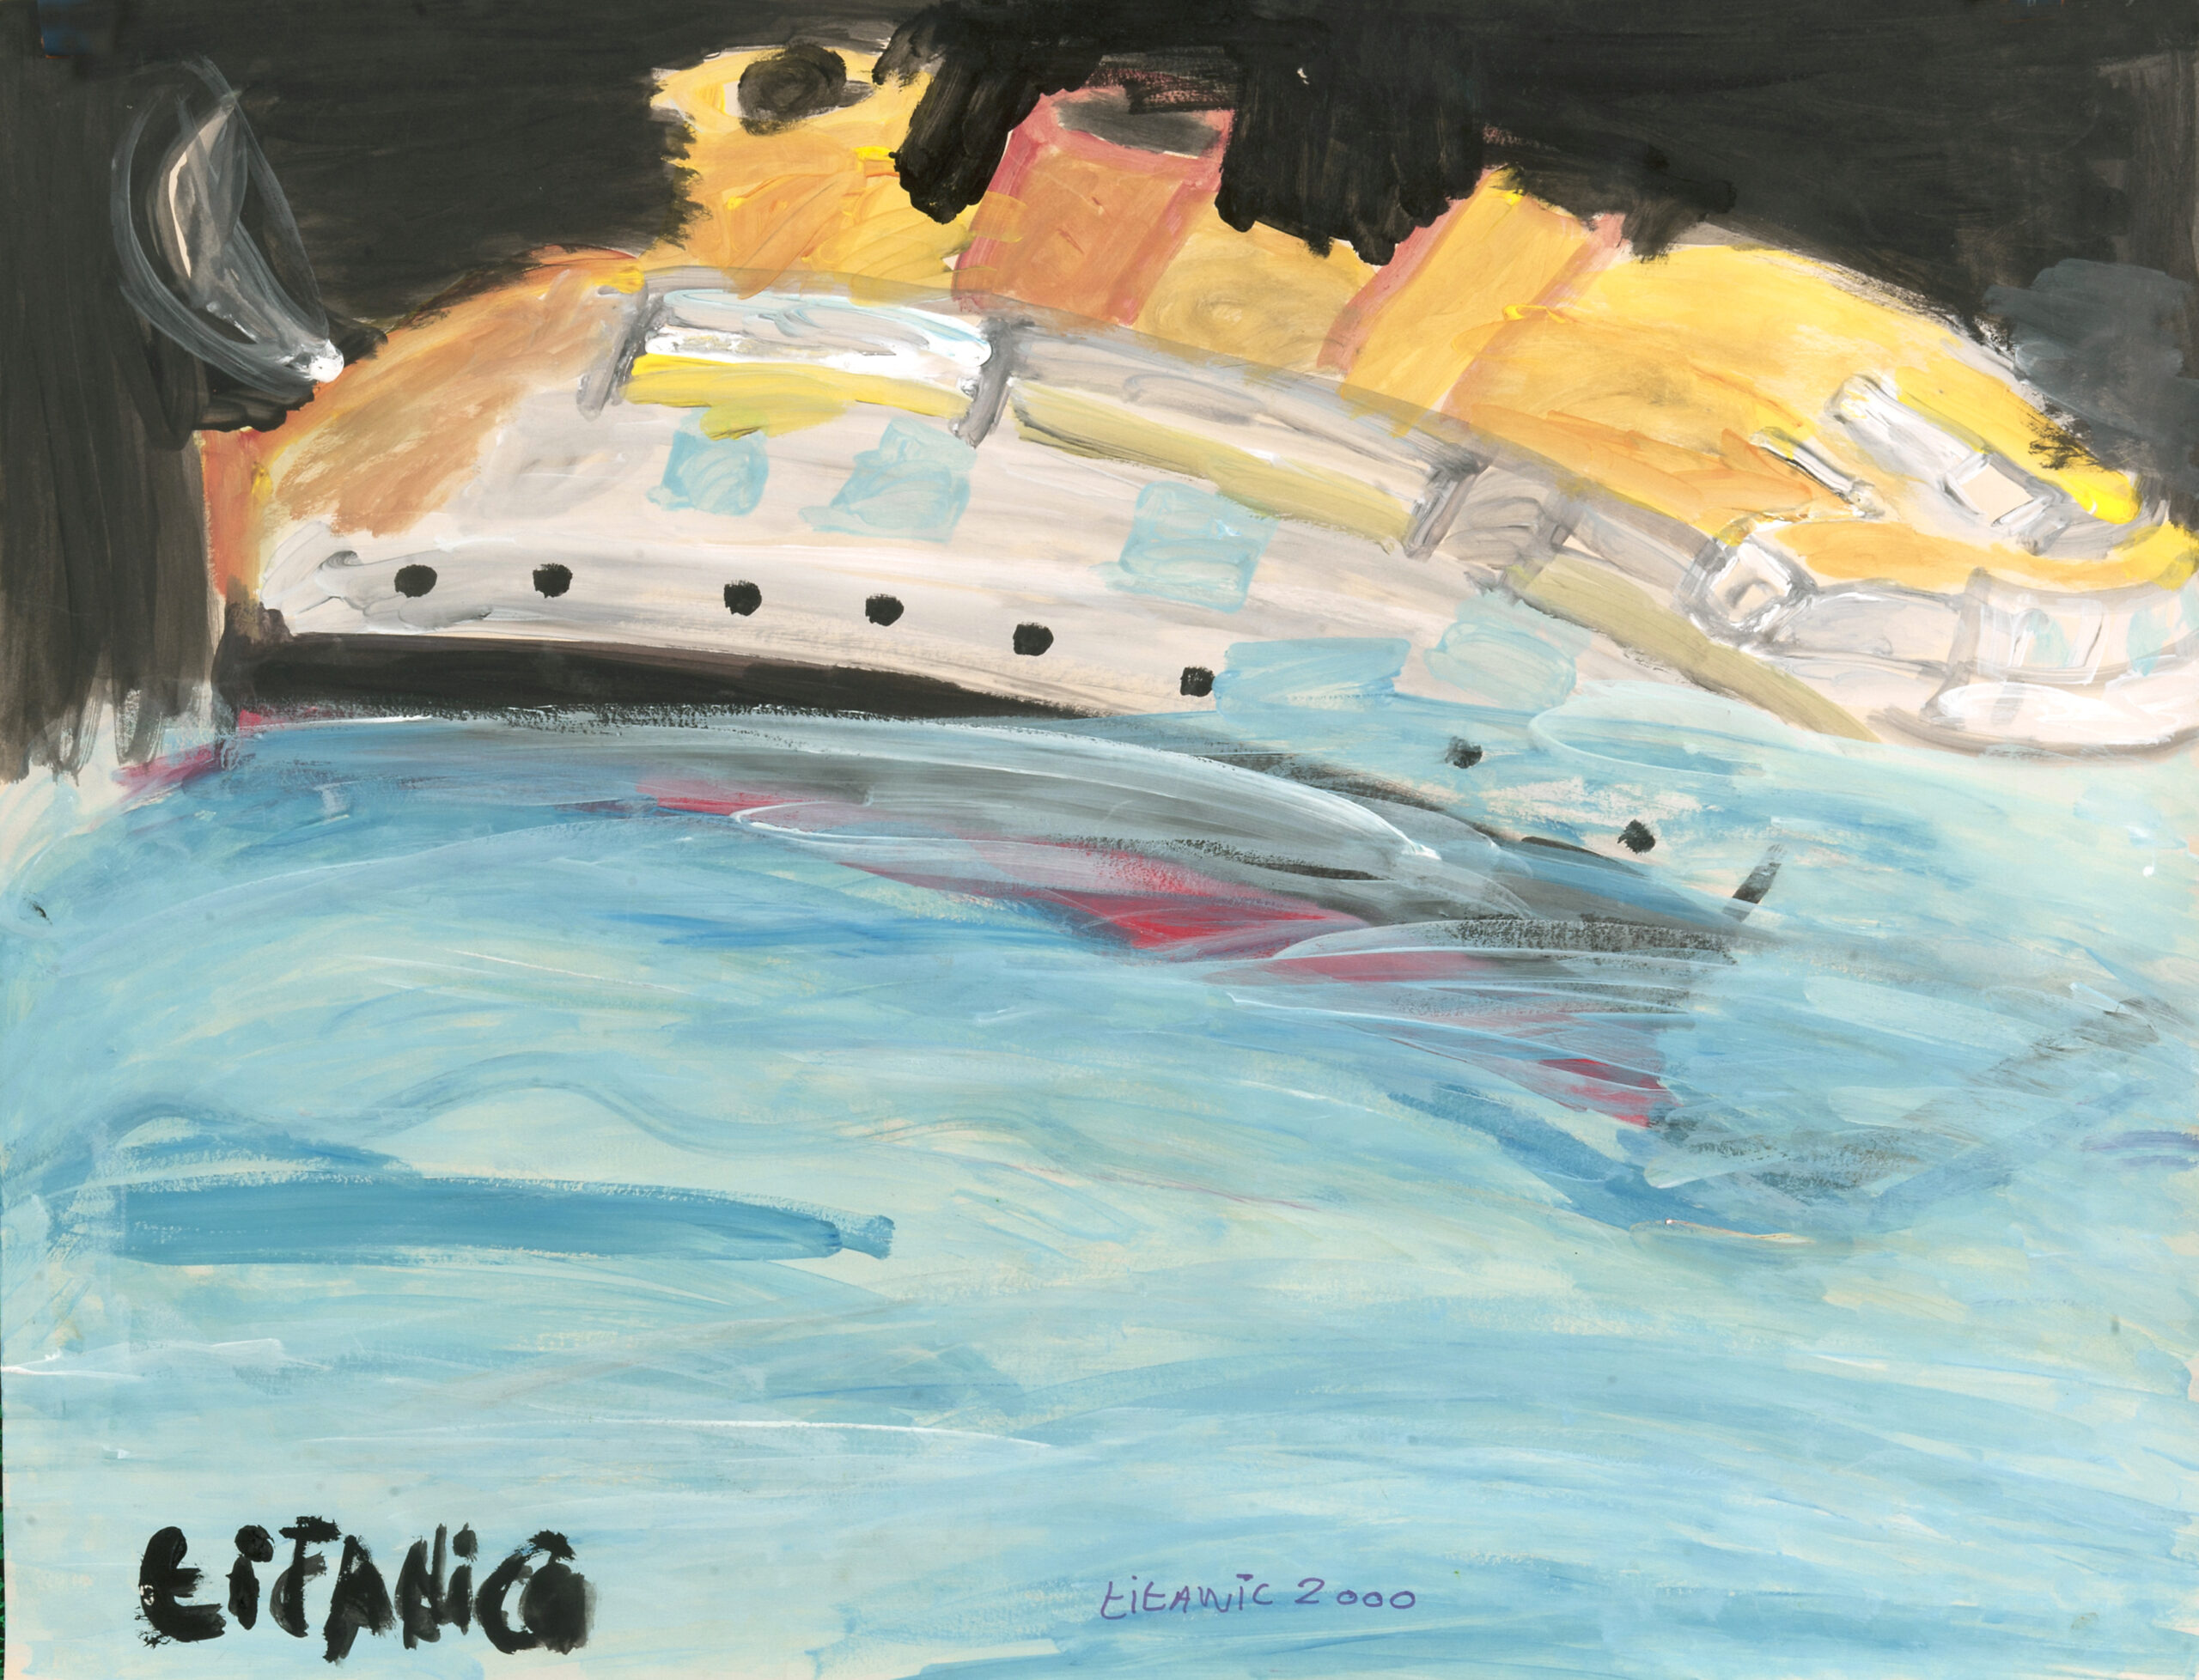 François Peeters, Série Titanic 1, 2010